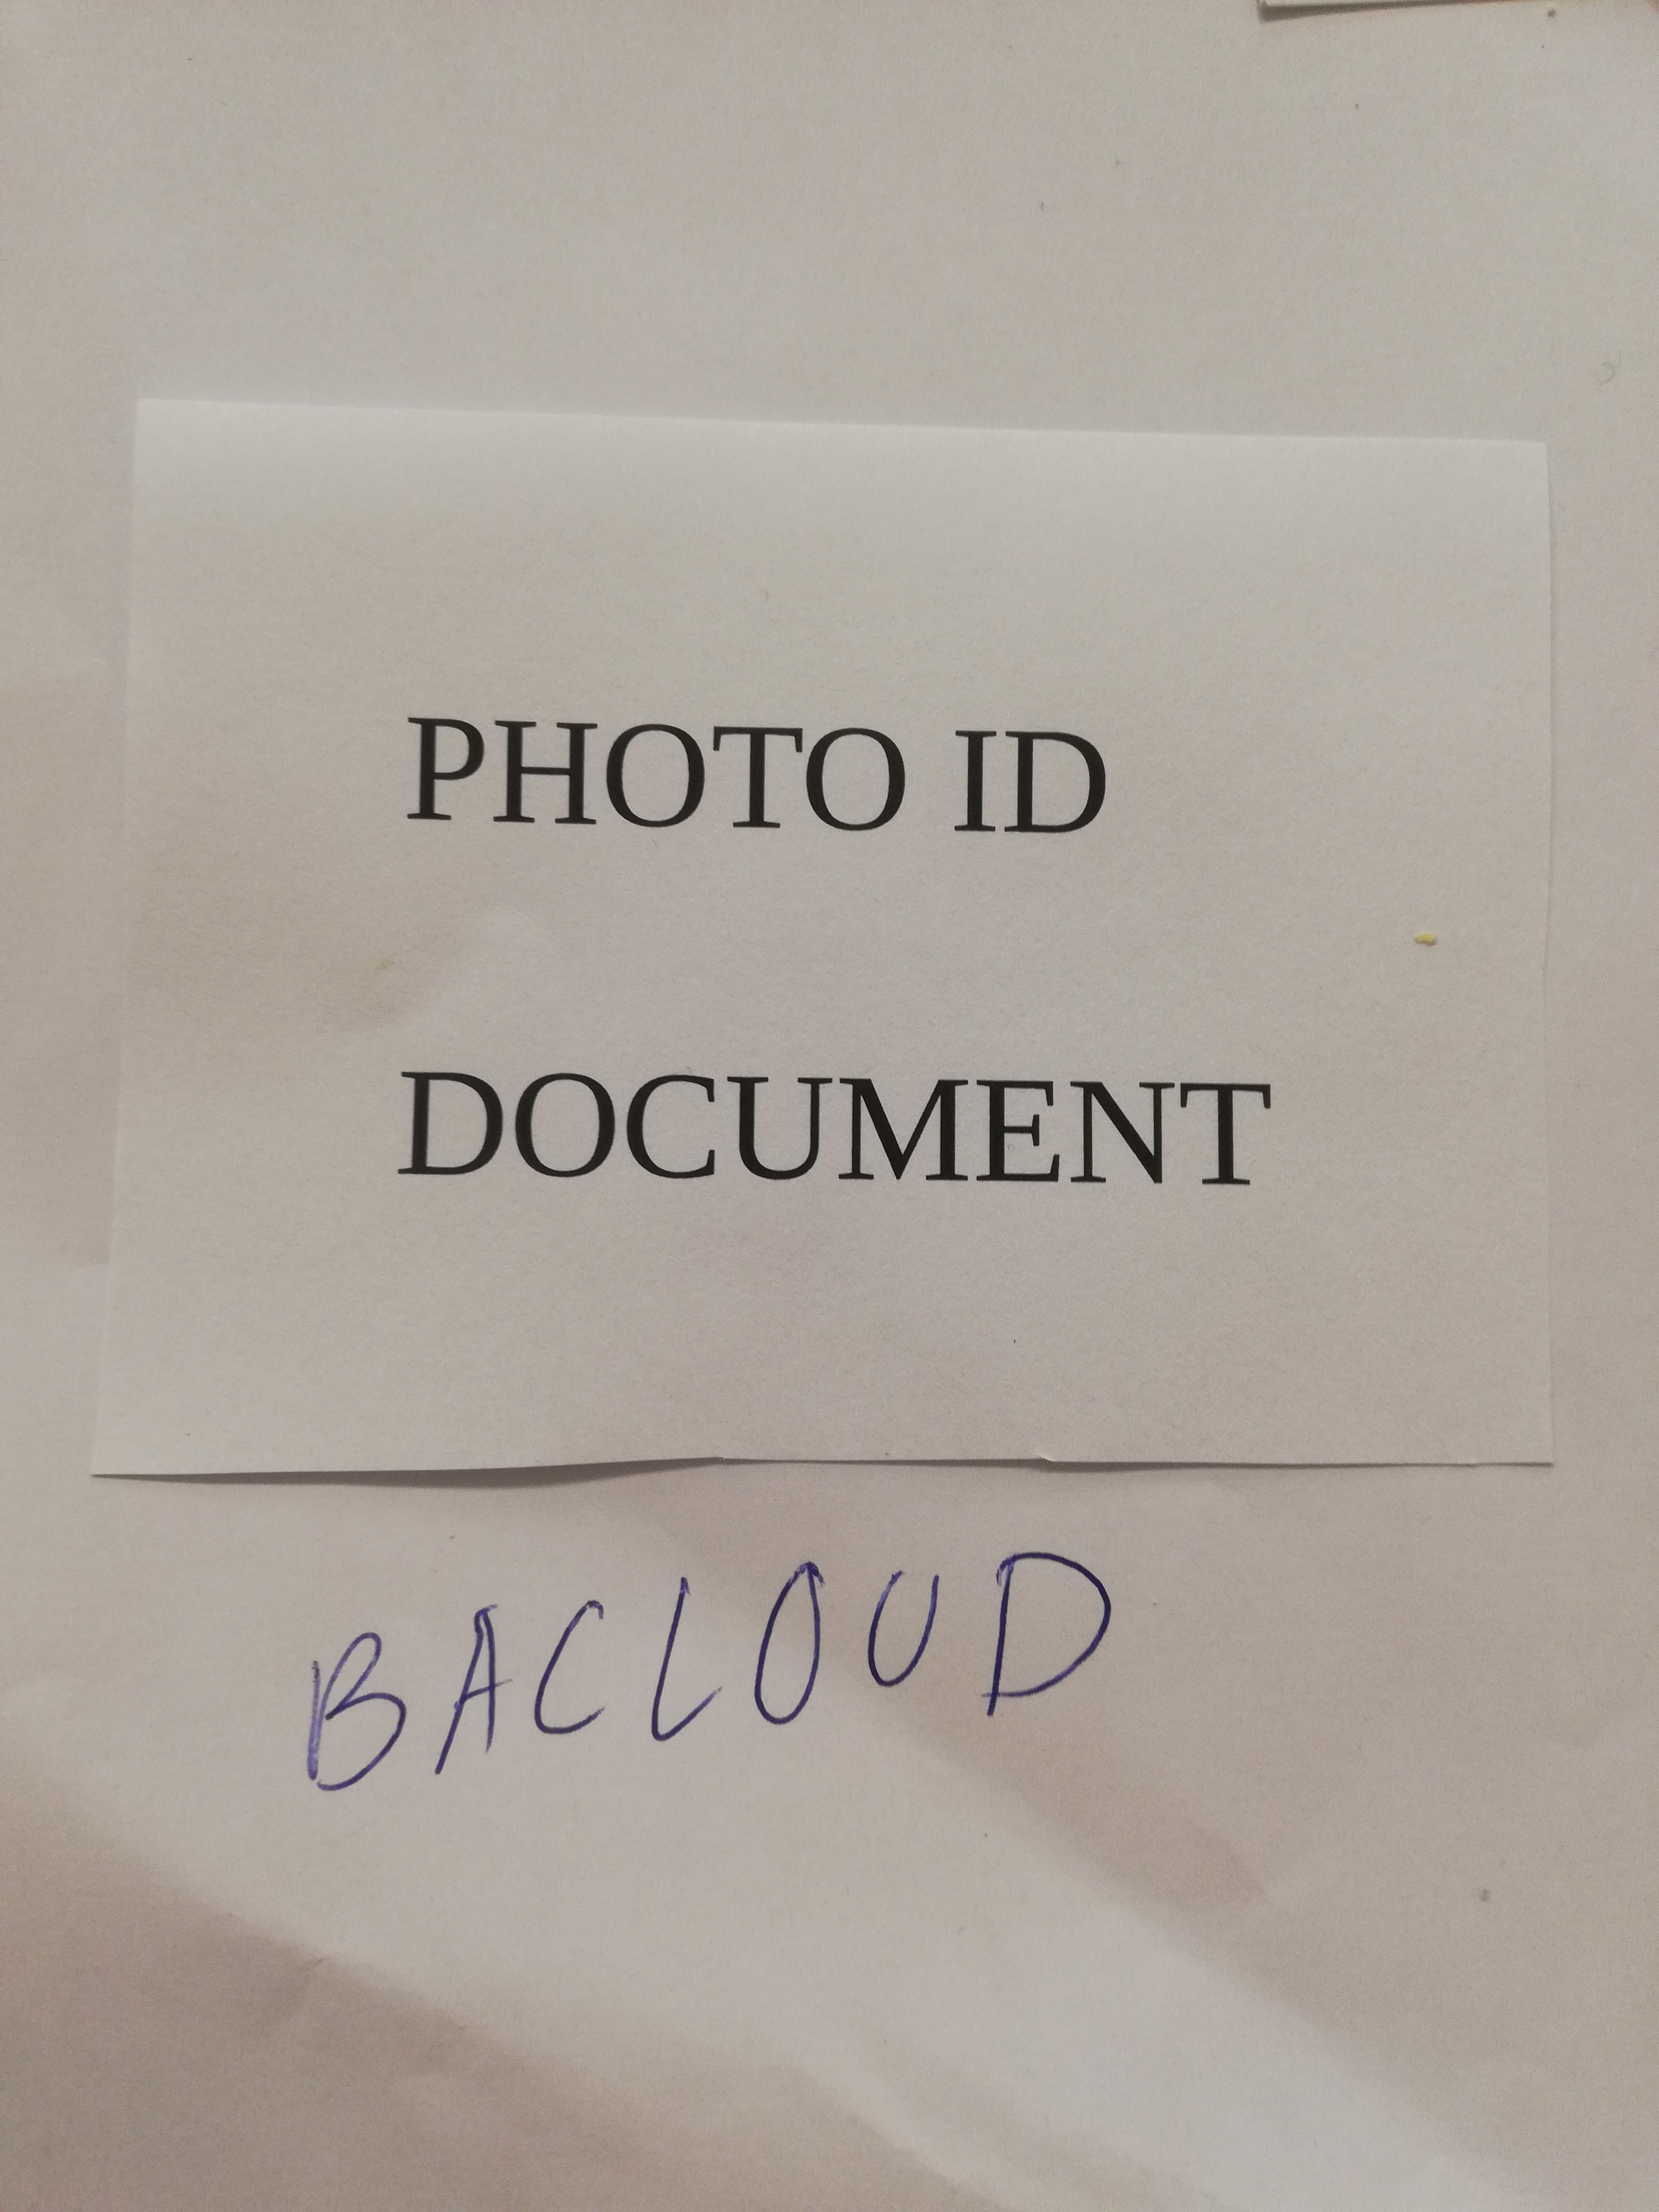 Bacloud paper photo ID